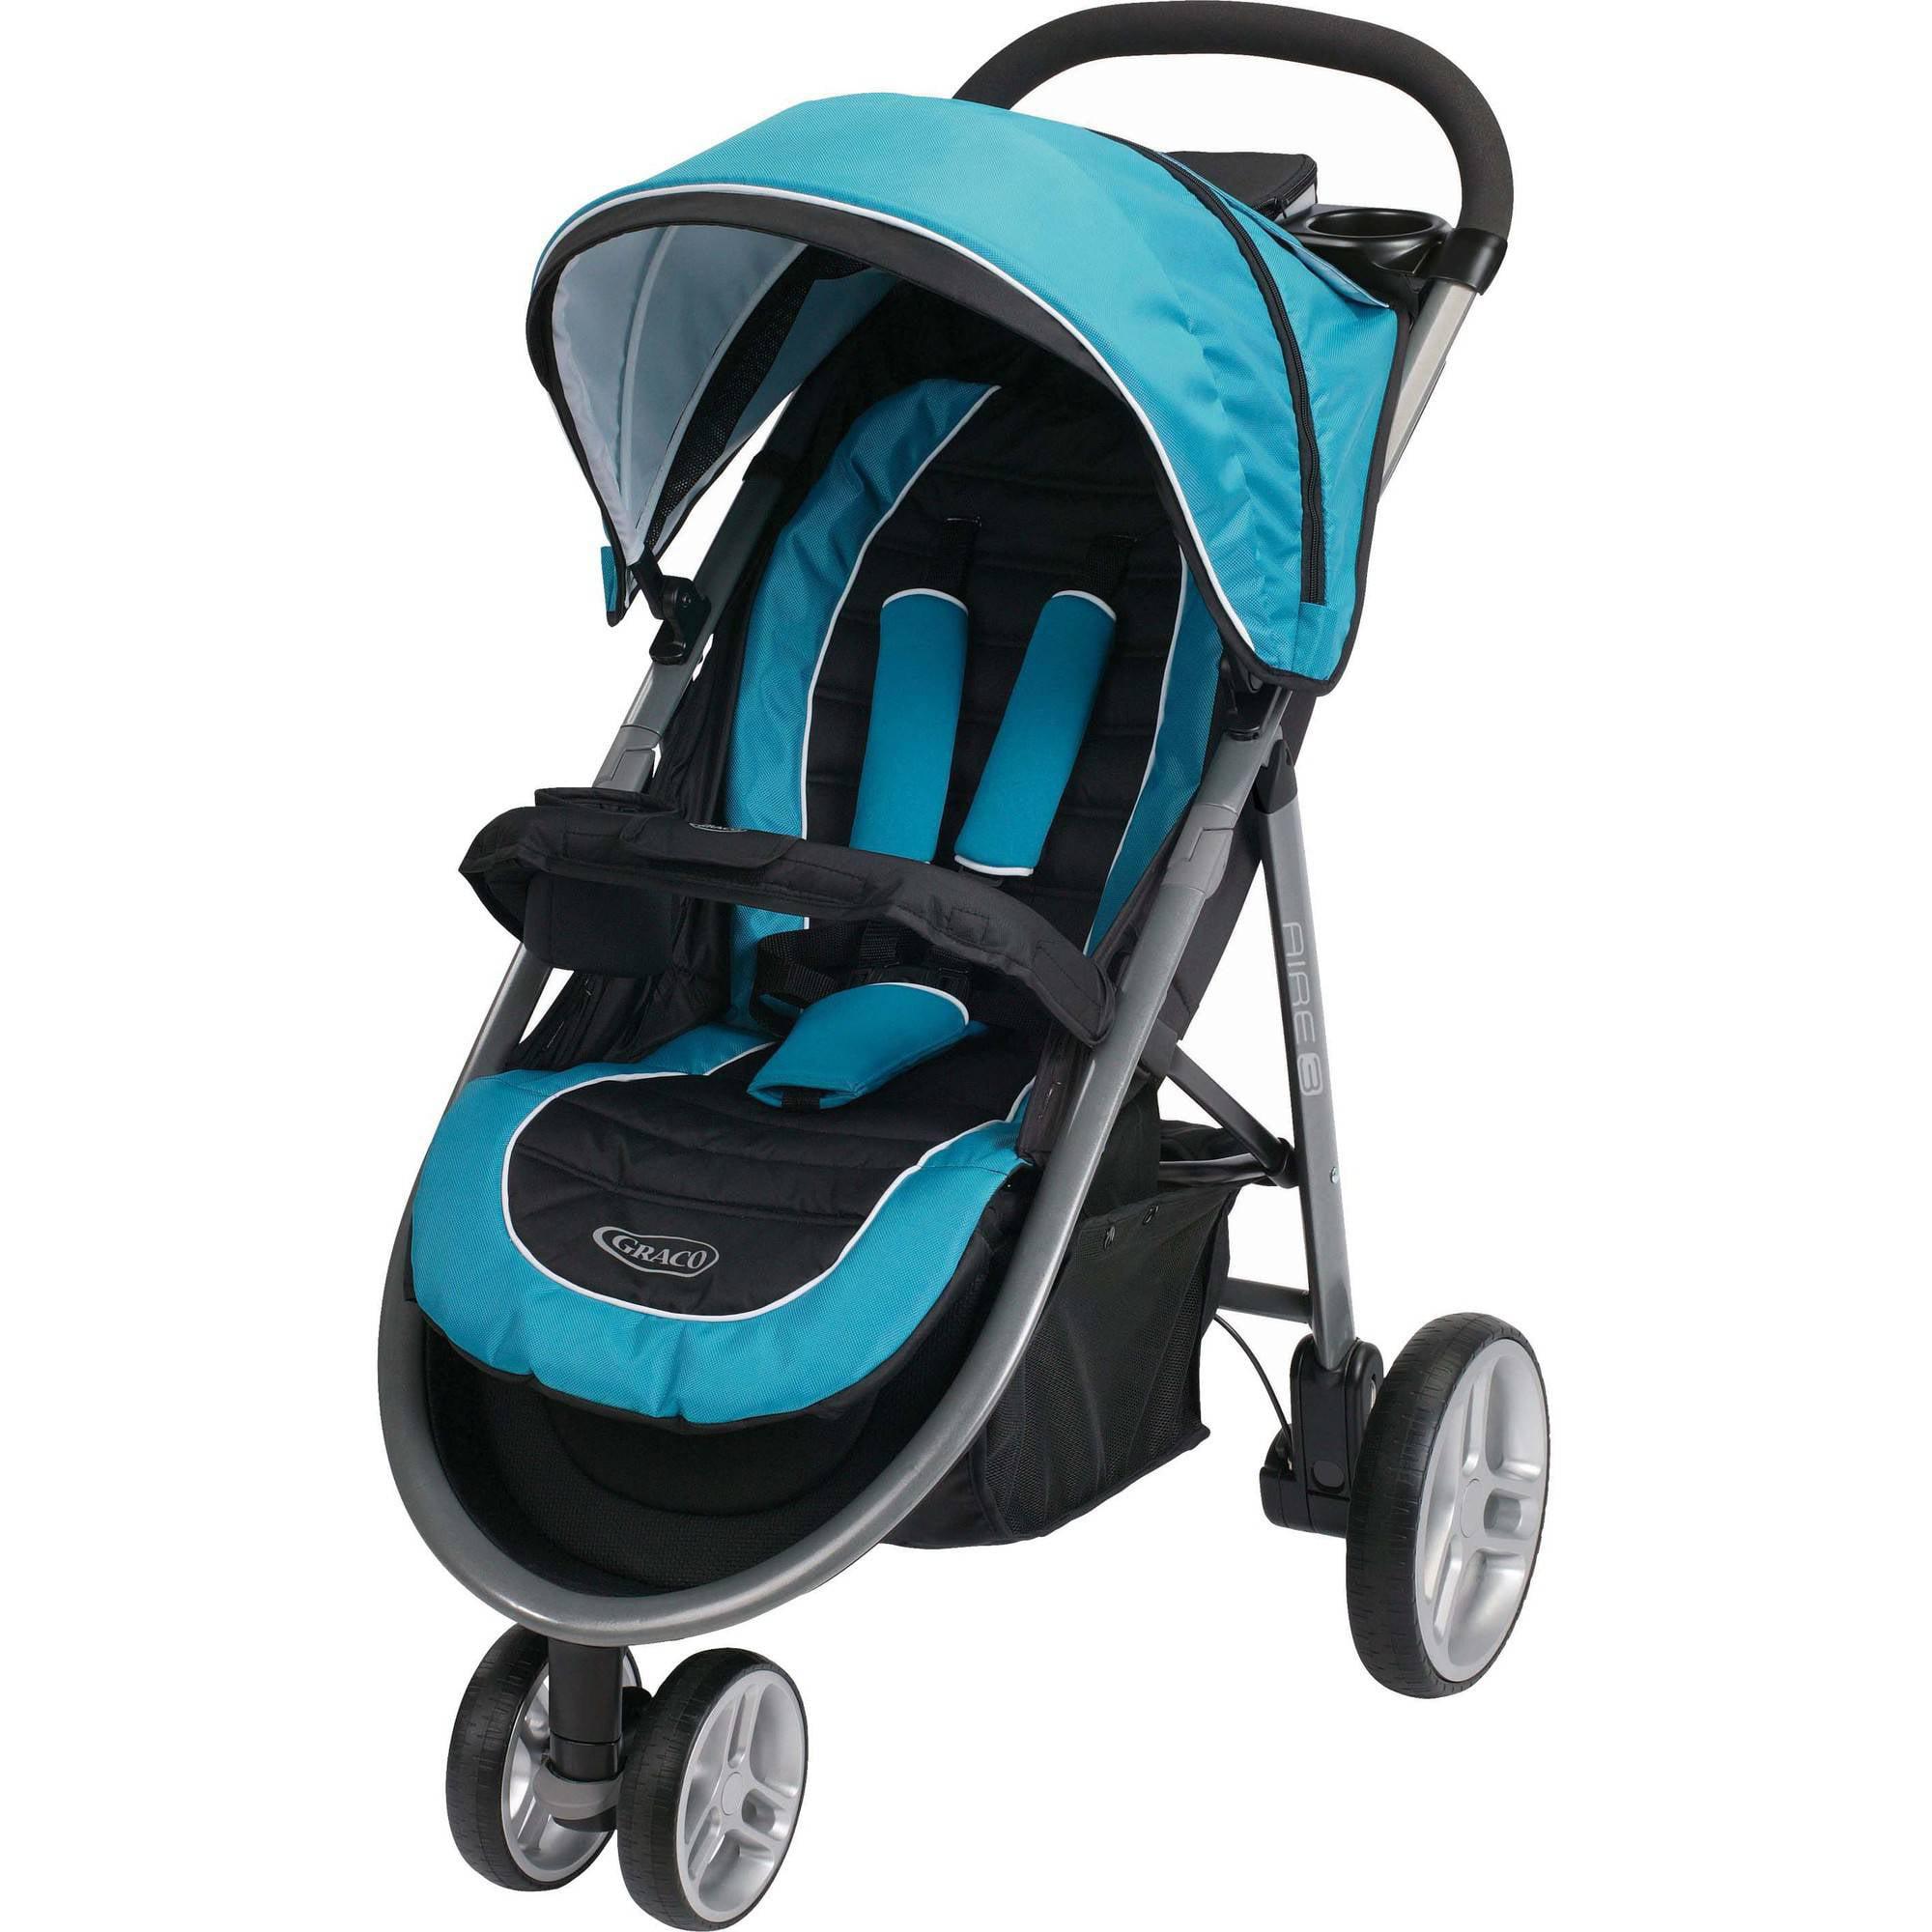 Graco Aire3 Click Connect Lightweight 3-Wheel Stroller, Poseidon